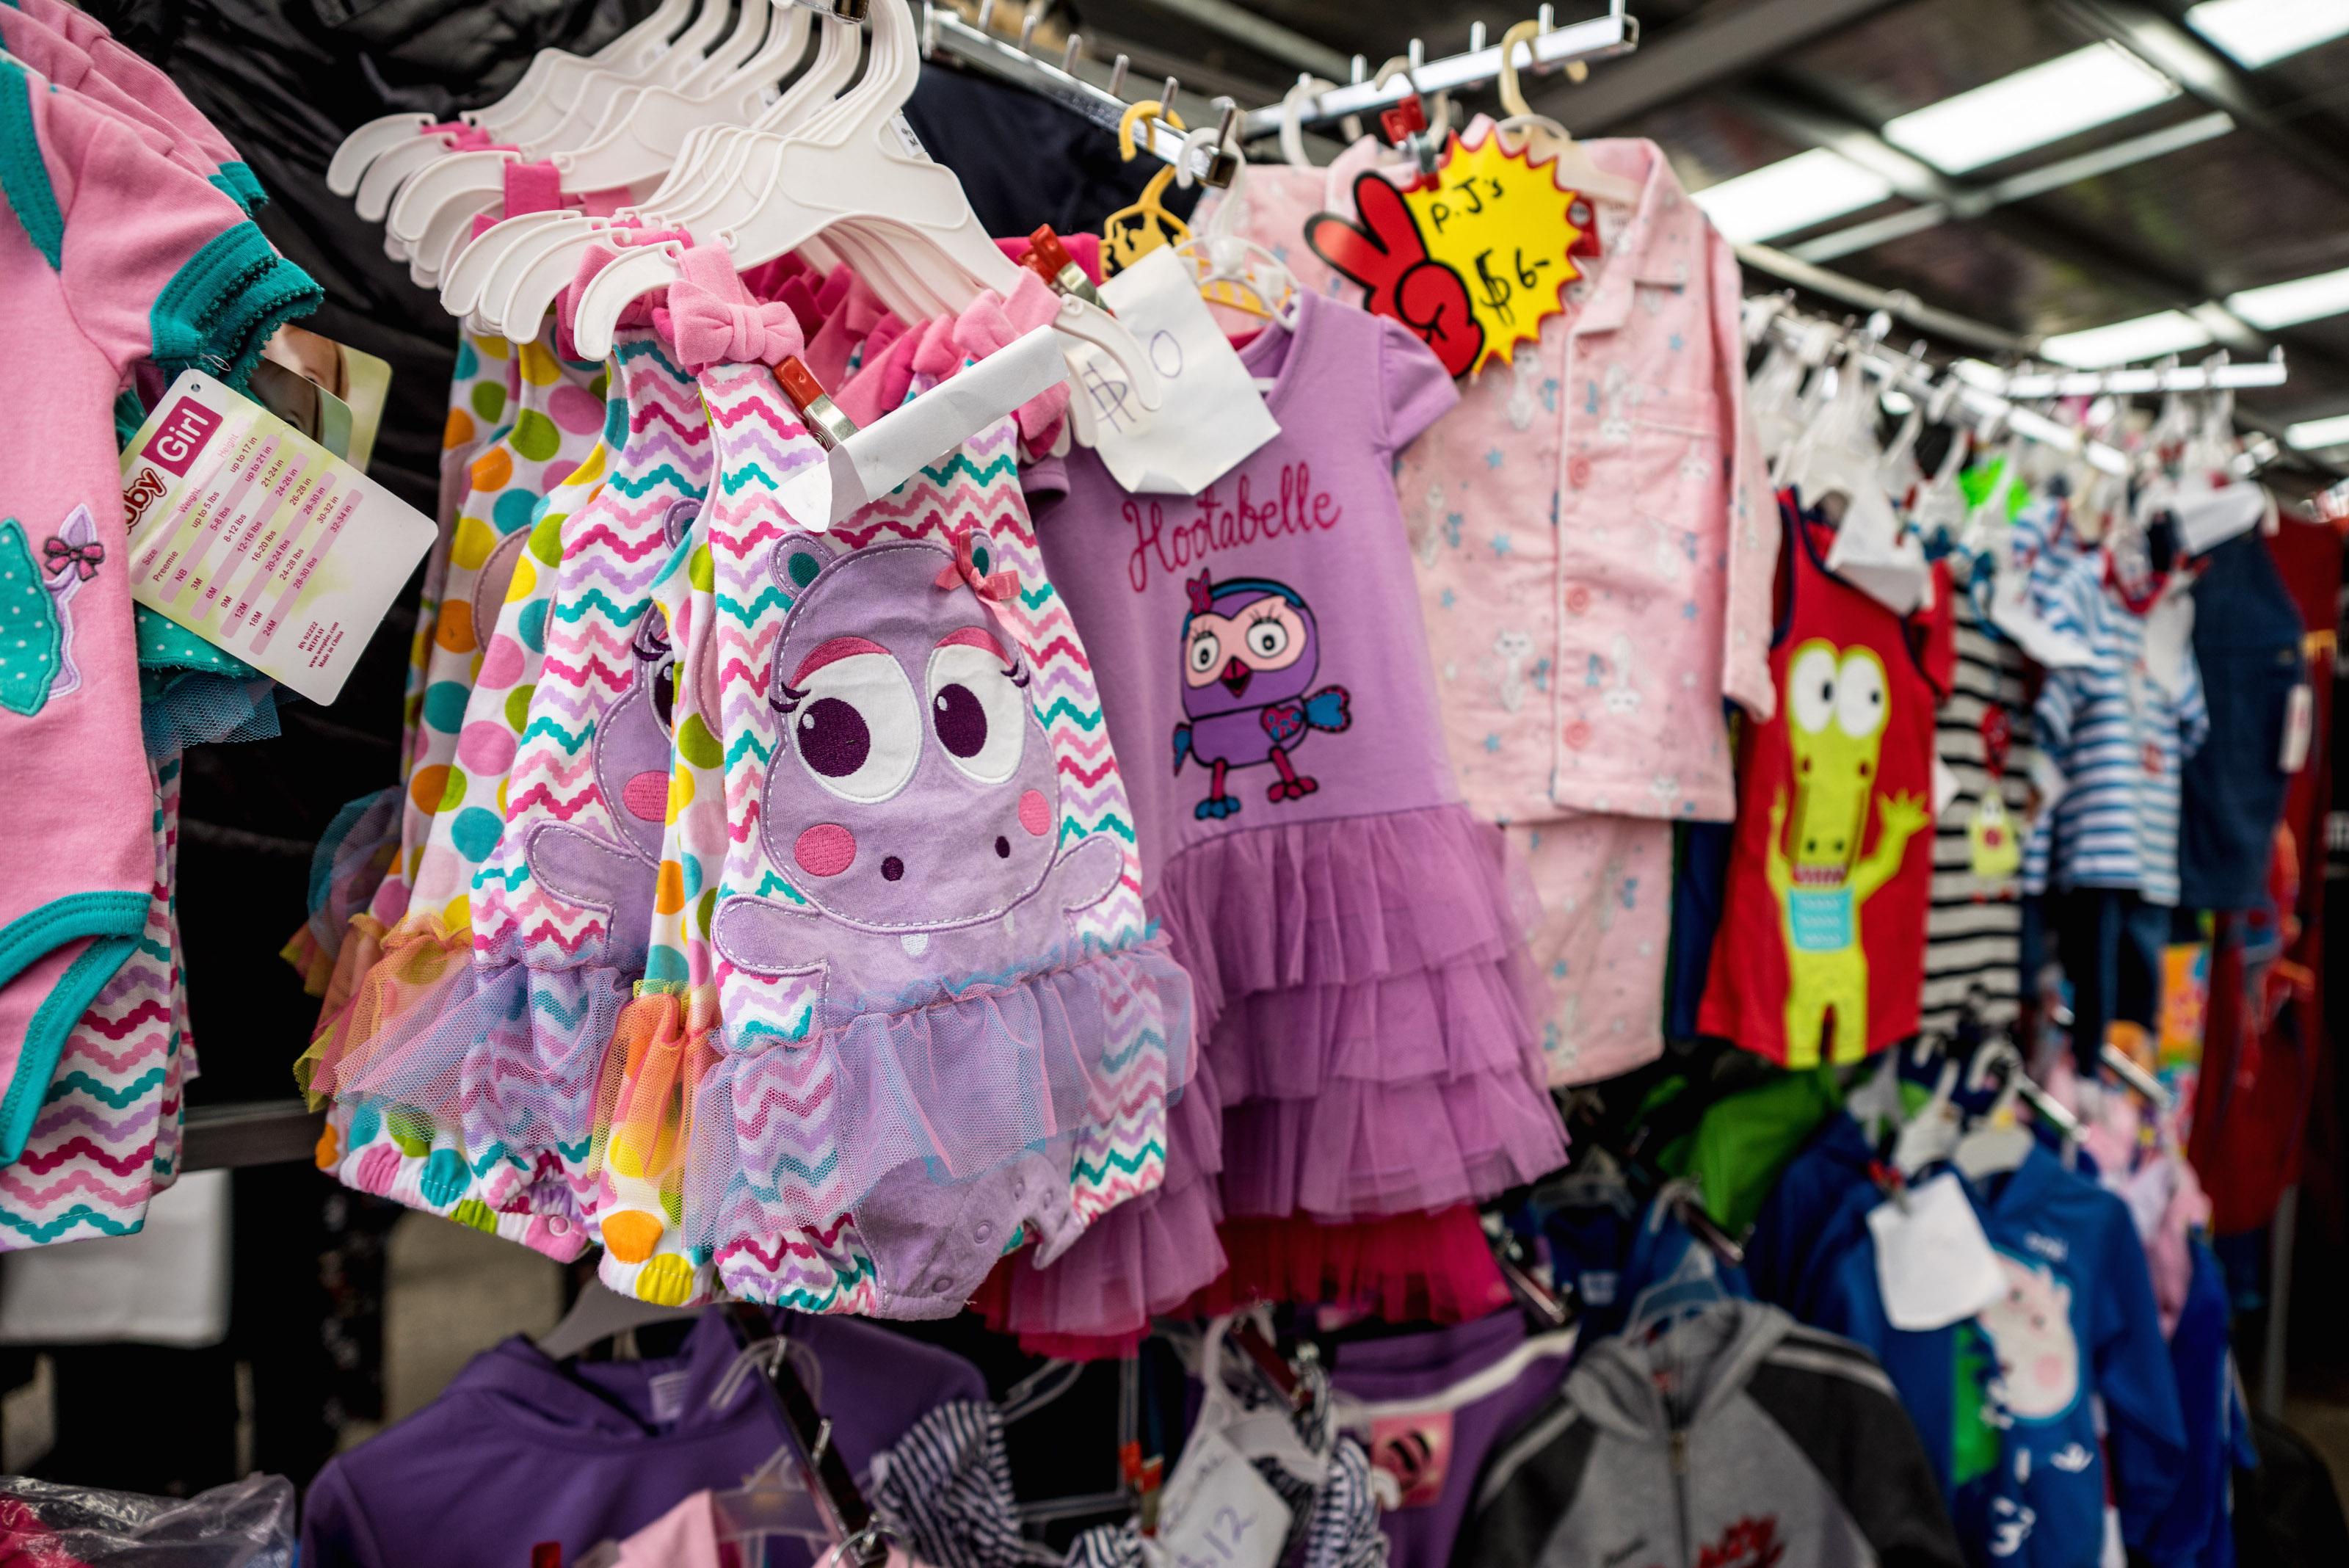 Childrens Clothes market caribbean gardens,Childrens Clothes Melbourne